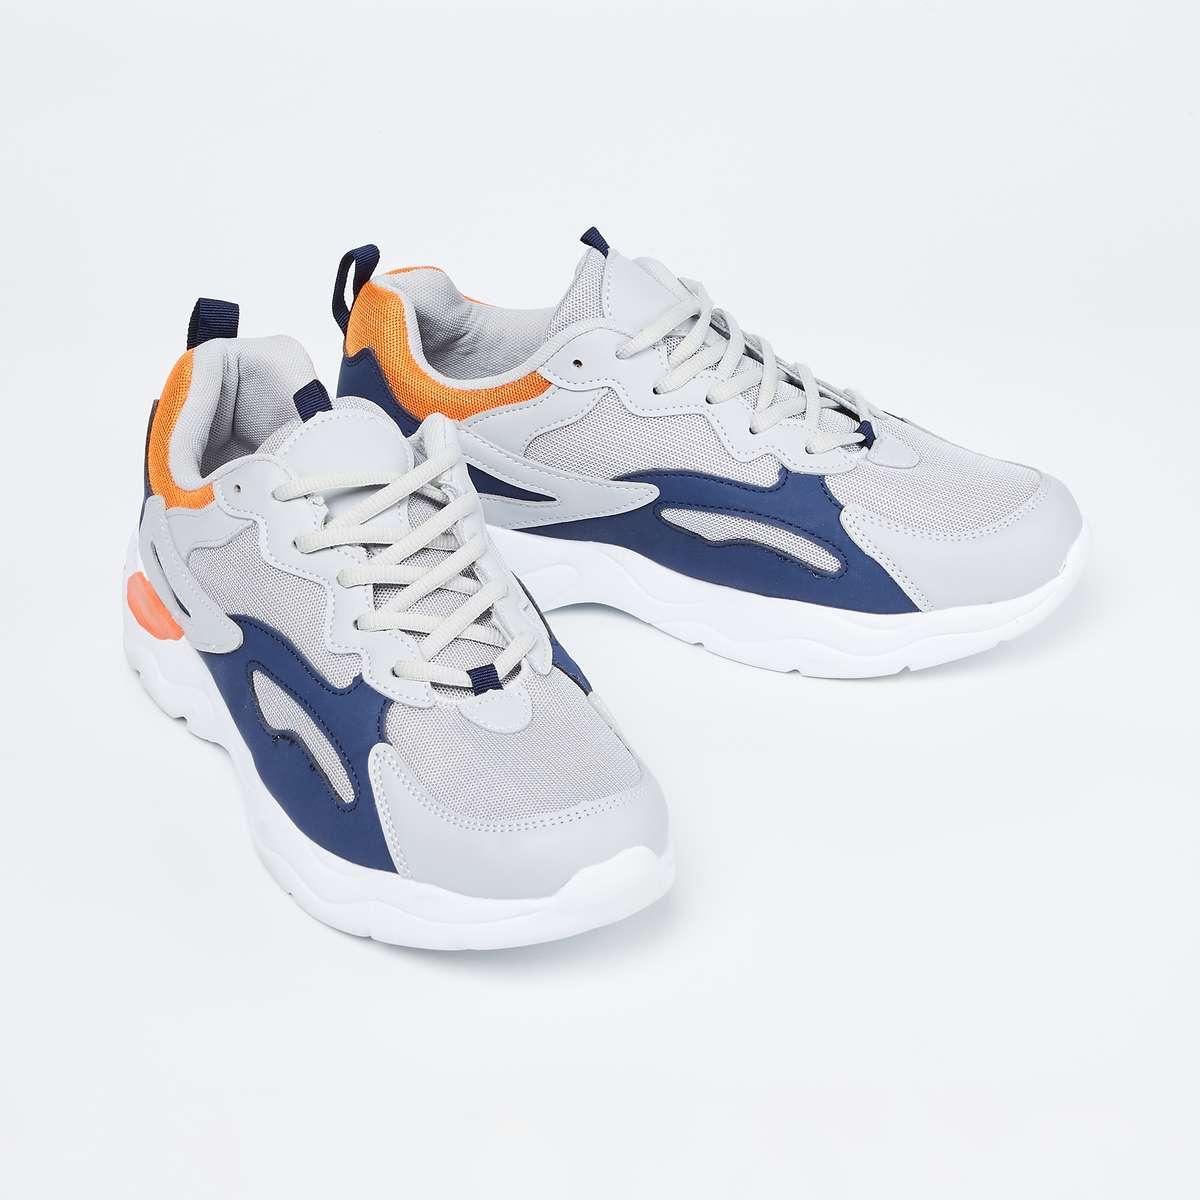 3.FORCA Colourblock Lace-Up Casual Shoes